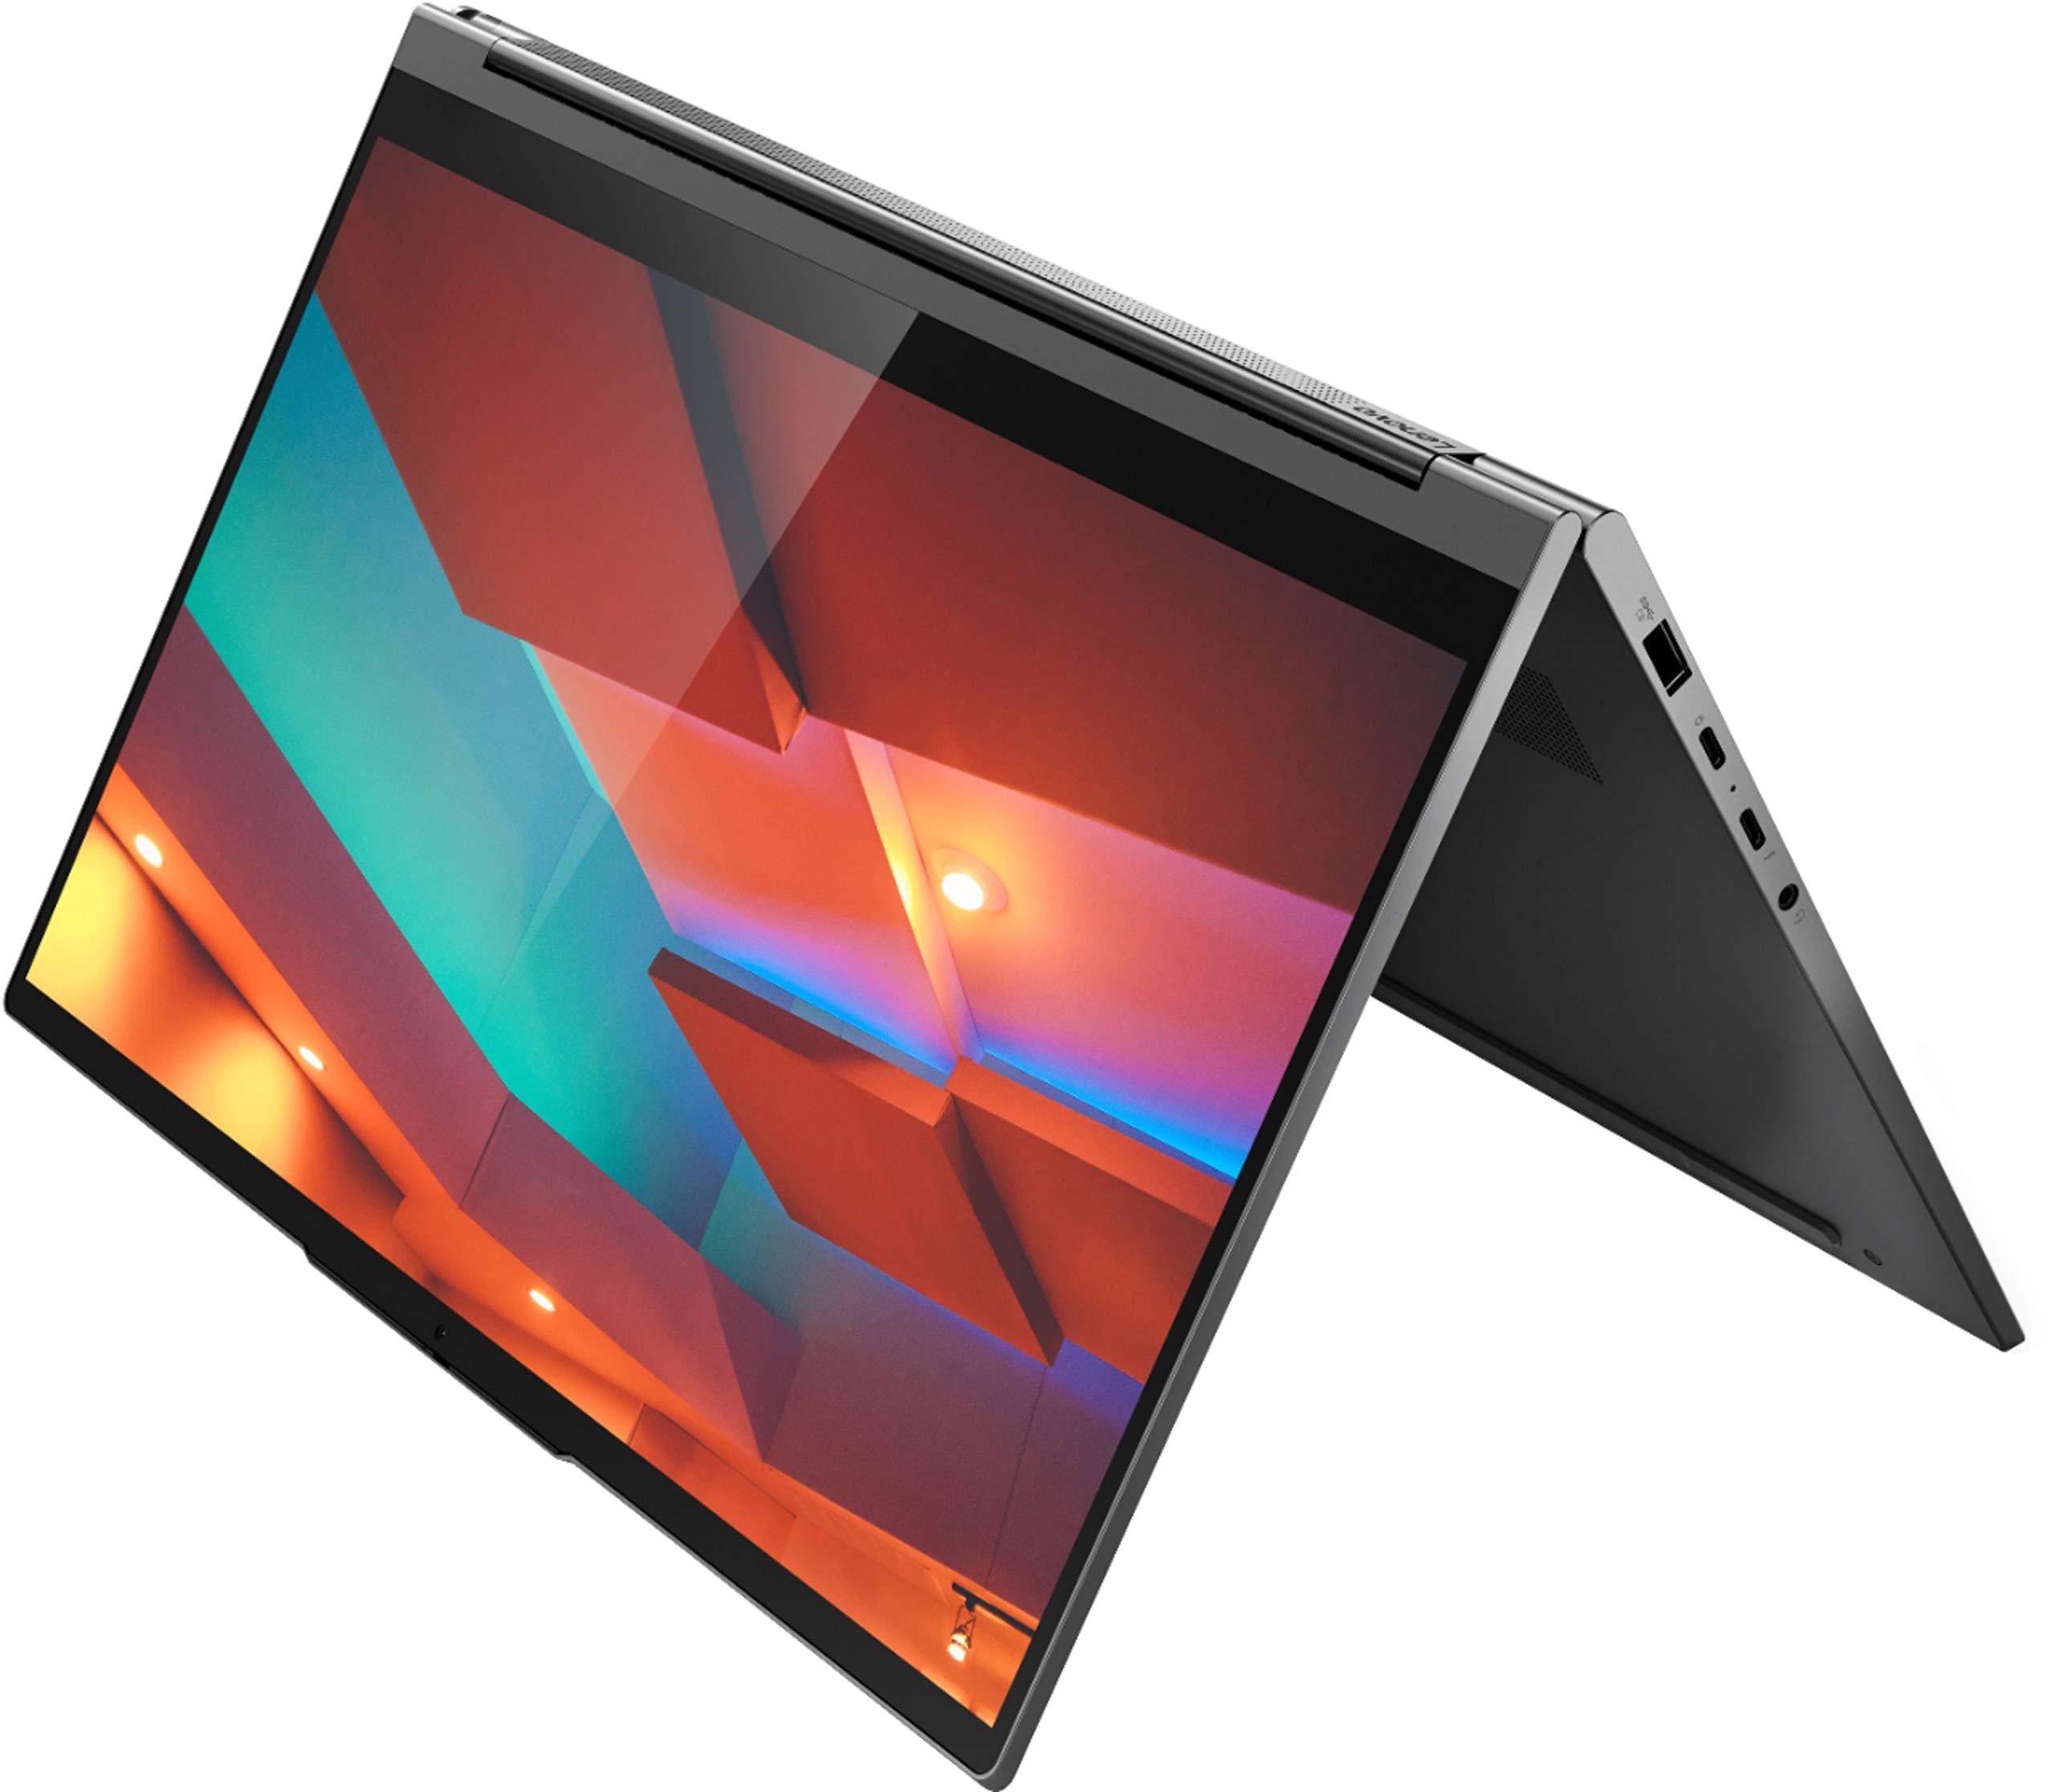 "Flagship 2021 Lenovo Yoga C940 2 in 1 Laptop 14"" Full HD IPS Touchscreen 10th Gen Intel Quad-Core i7-1065G7 12GB DDR4 512GB SSD Dolby Thunderbolt Backlit Fingerprint Win10 + USB-C Adapter"